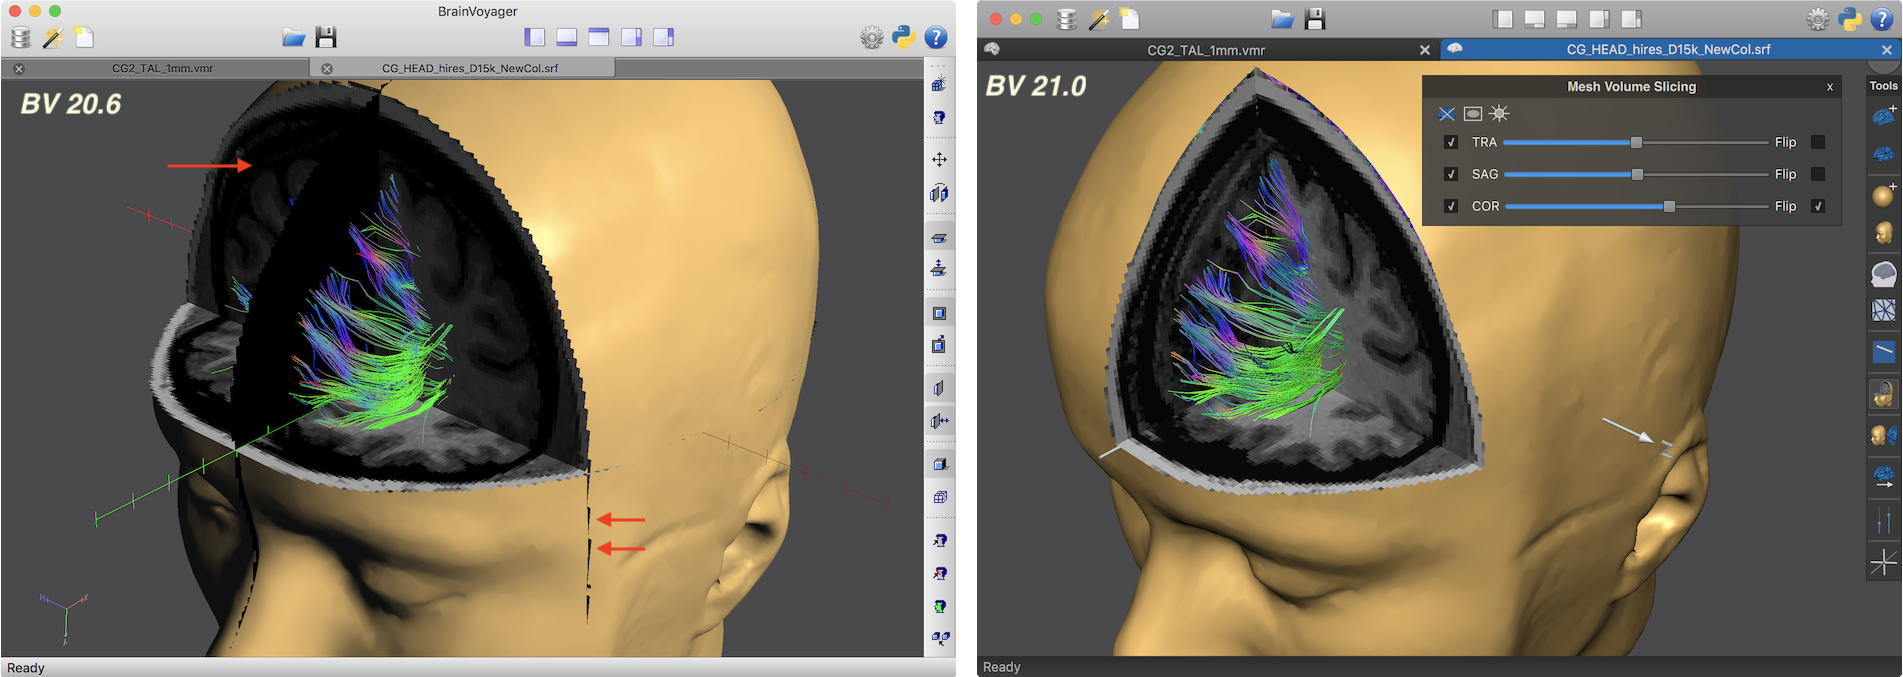 BrainVoyager 21 - BIDS, Defacing, 3D Viewer and Dark Mode